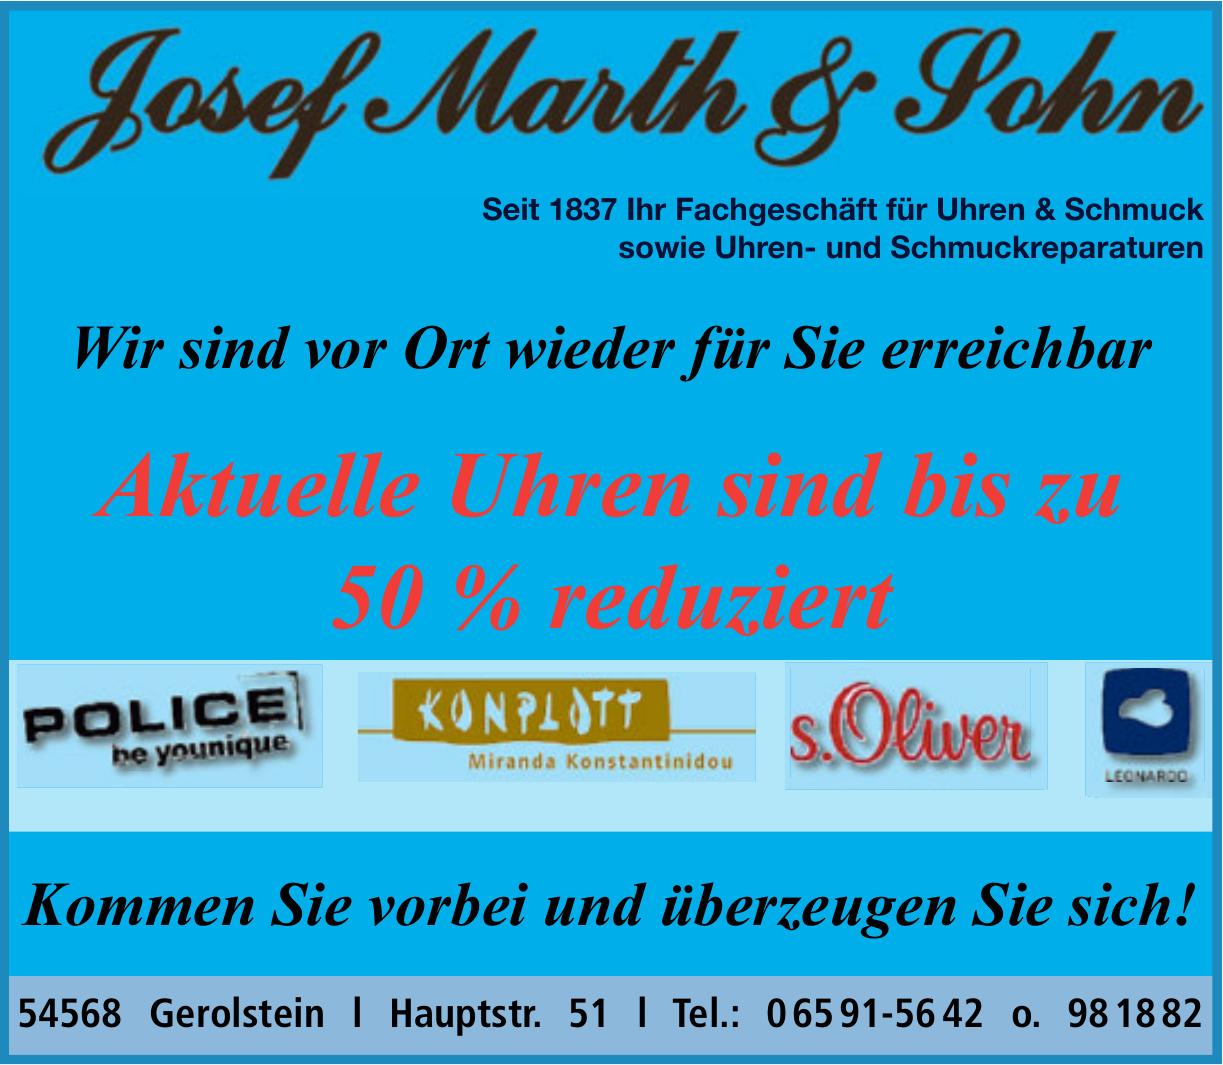 life style Josef Marth & Sohn